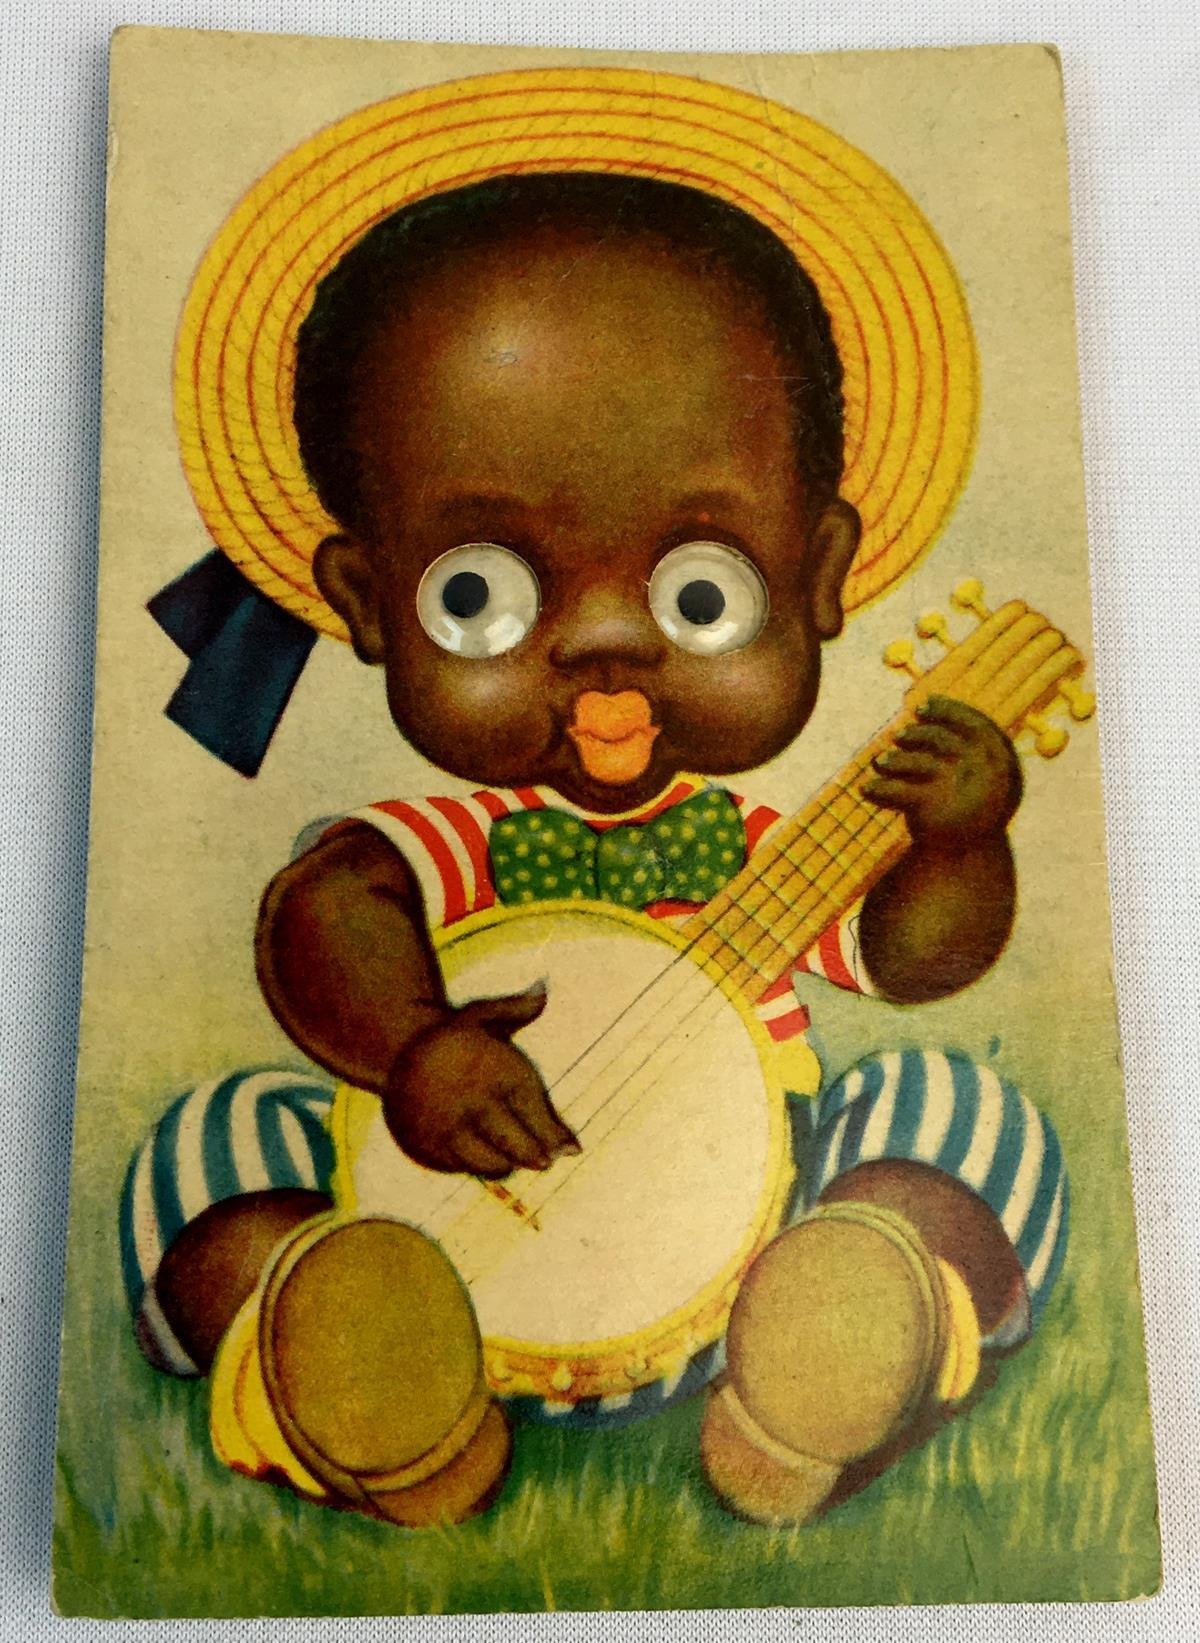 Antique c. 1910 Black Americana Patriotic Baby Playing The Banjo Squeaker Post Card w/ Googly Eyes